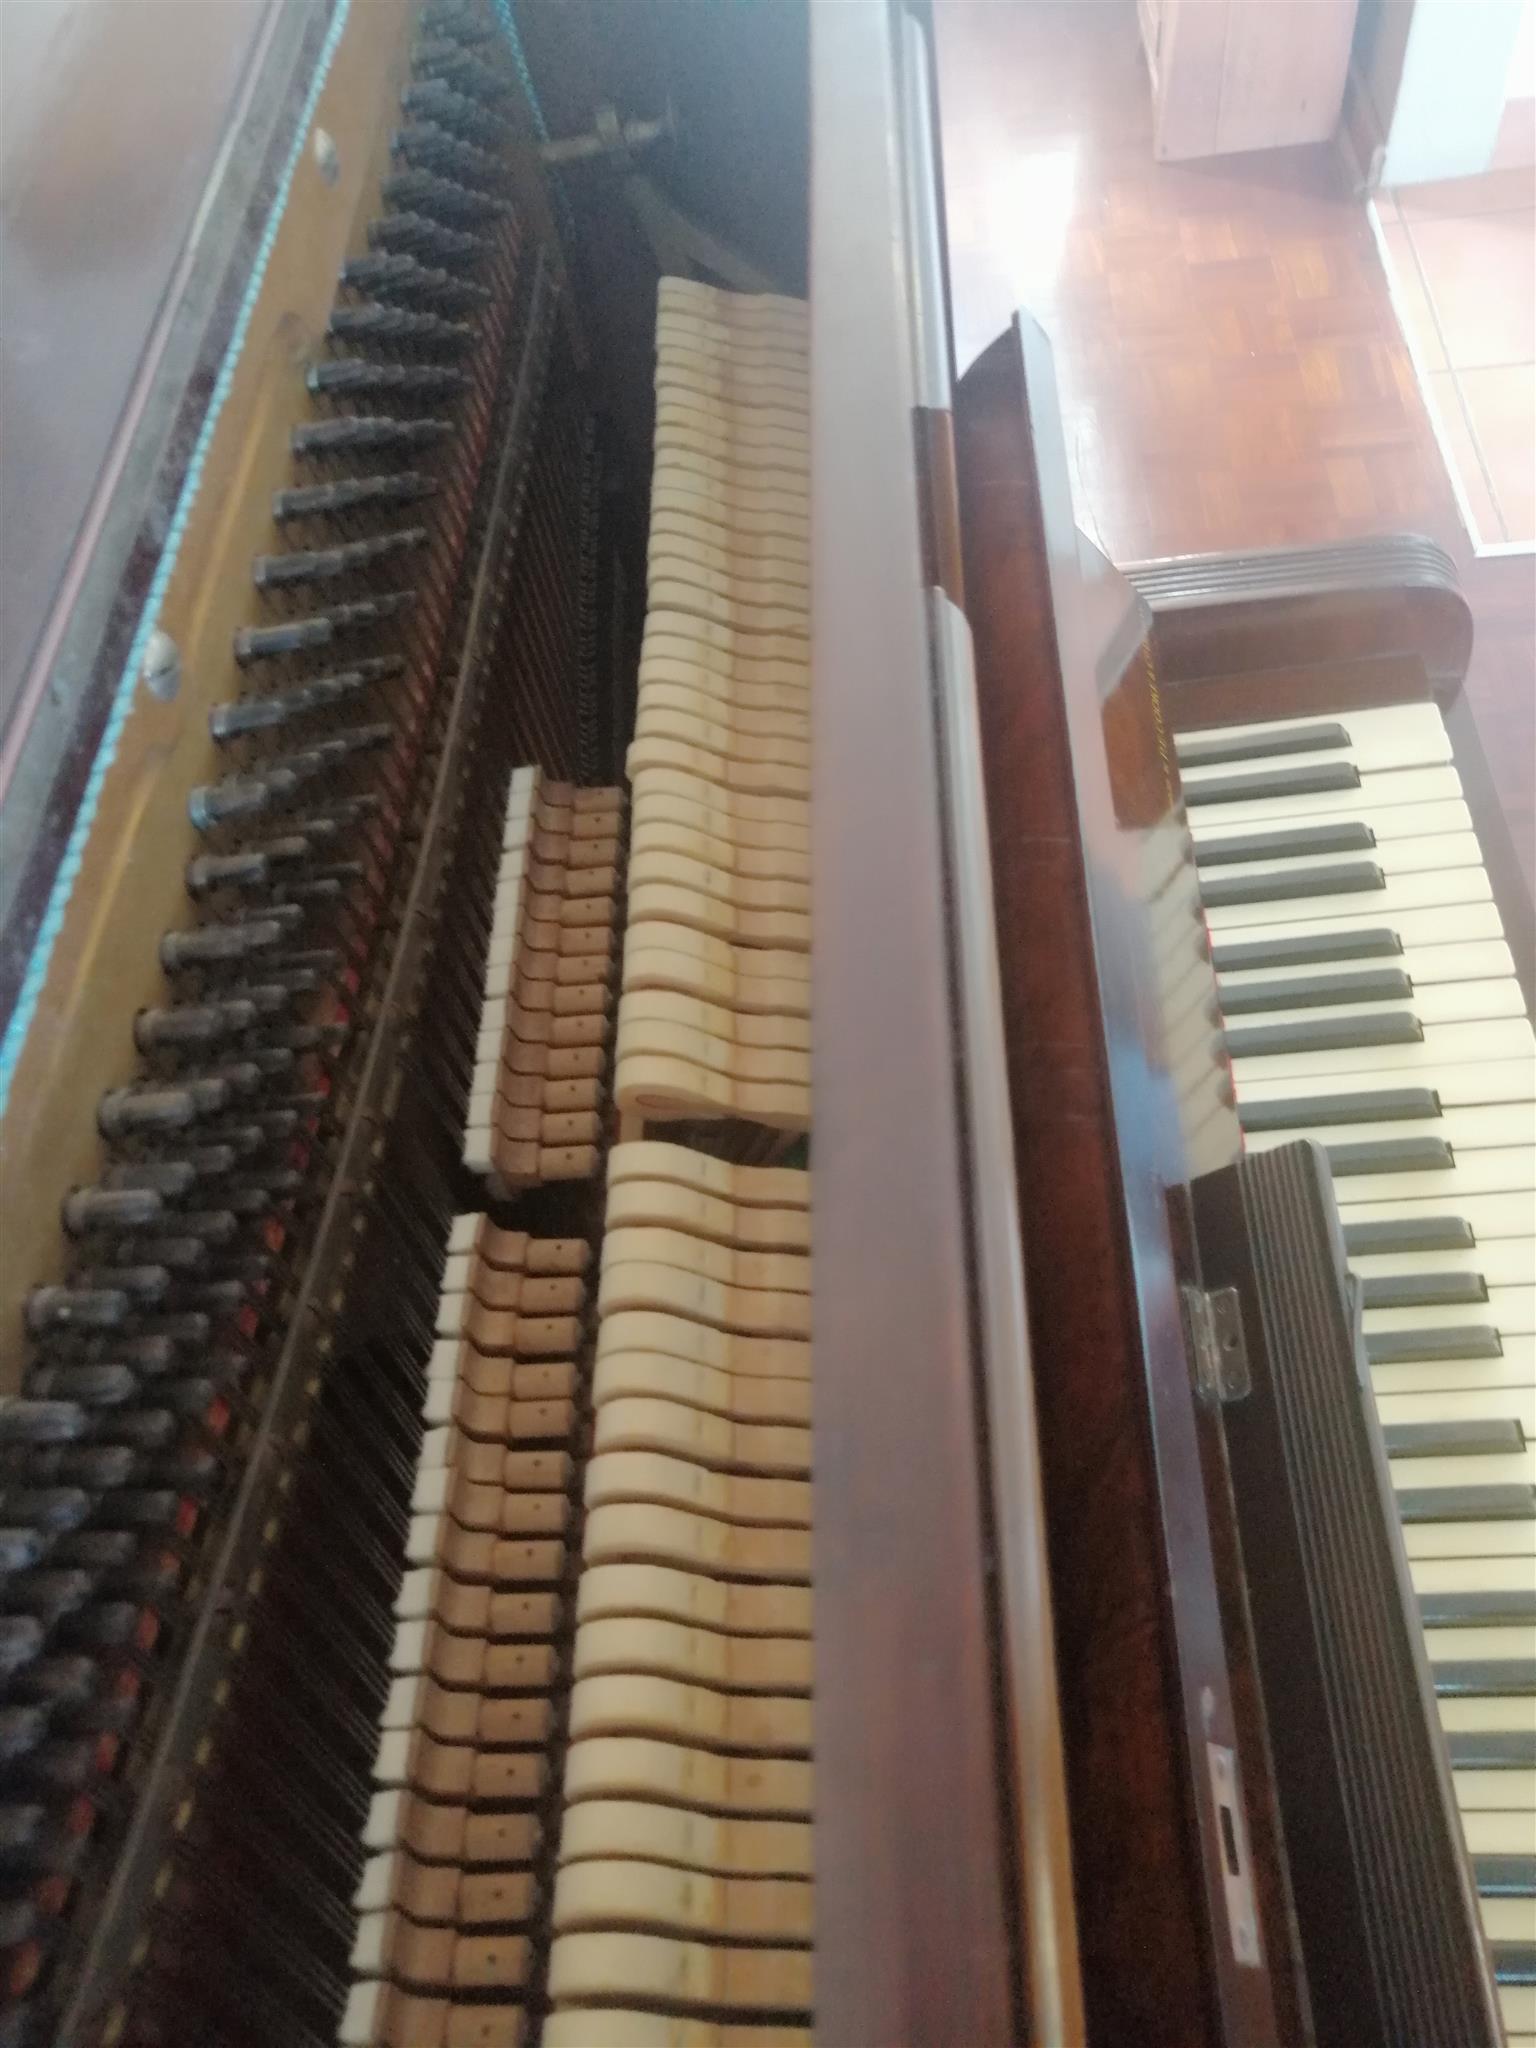 Hoffmann&Co Leipzig upright piano